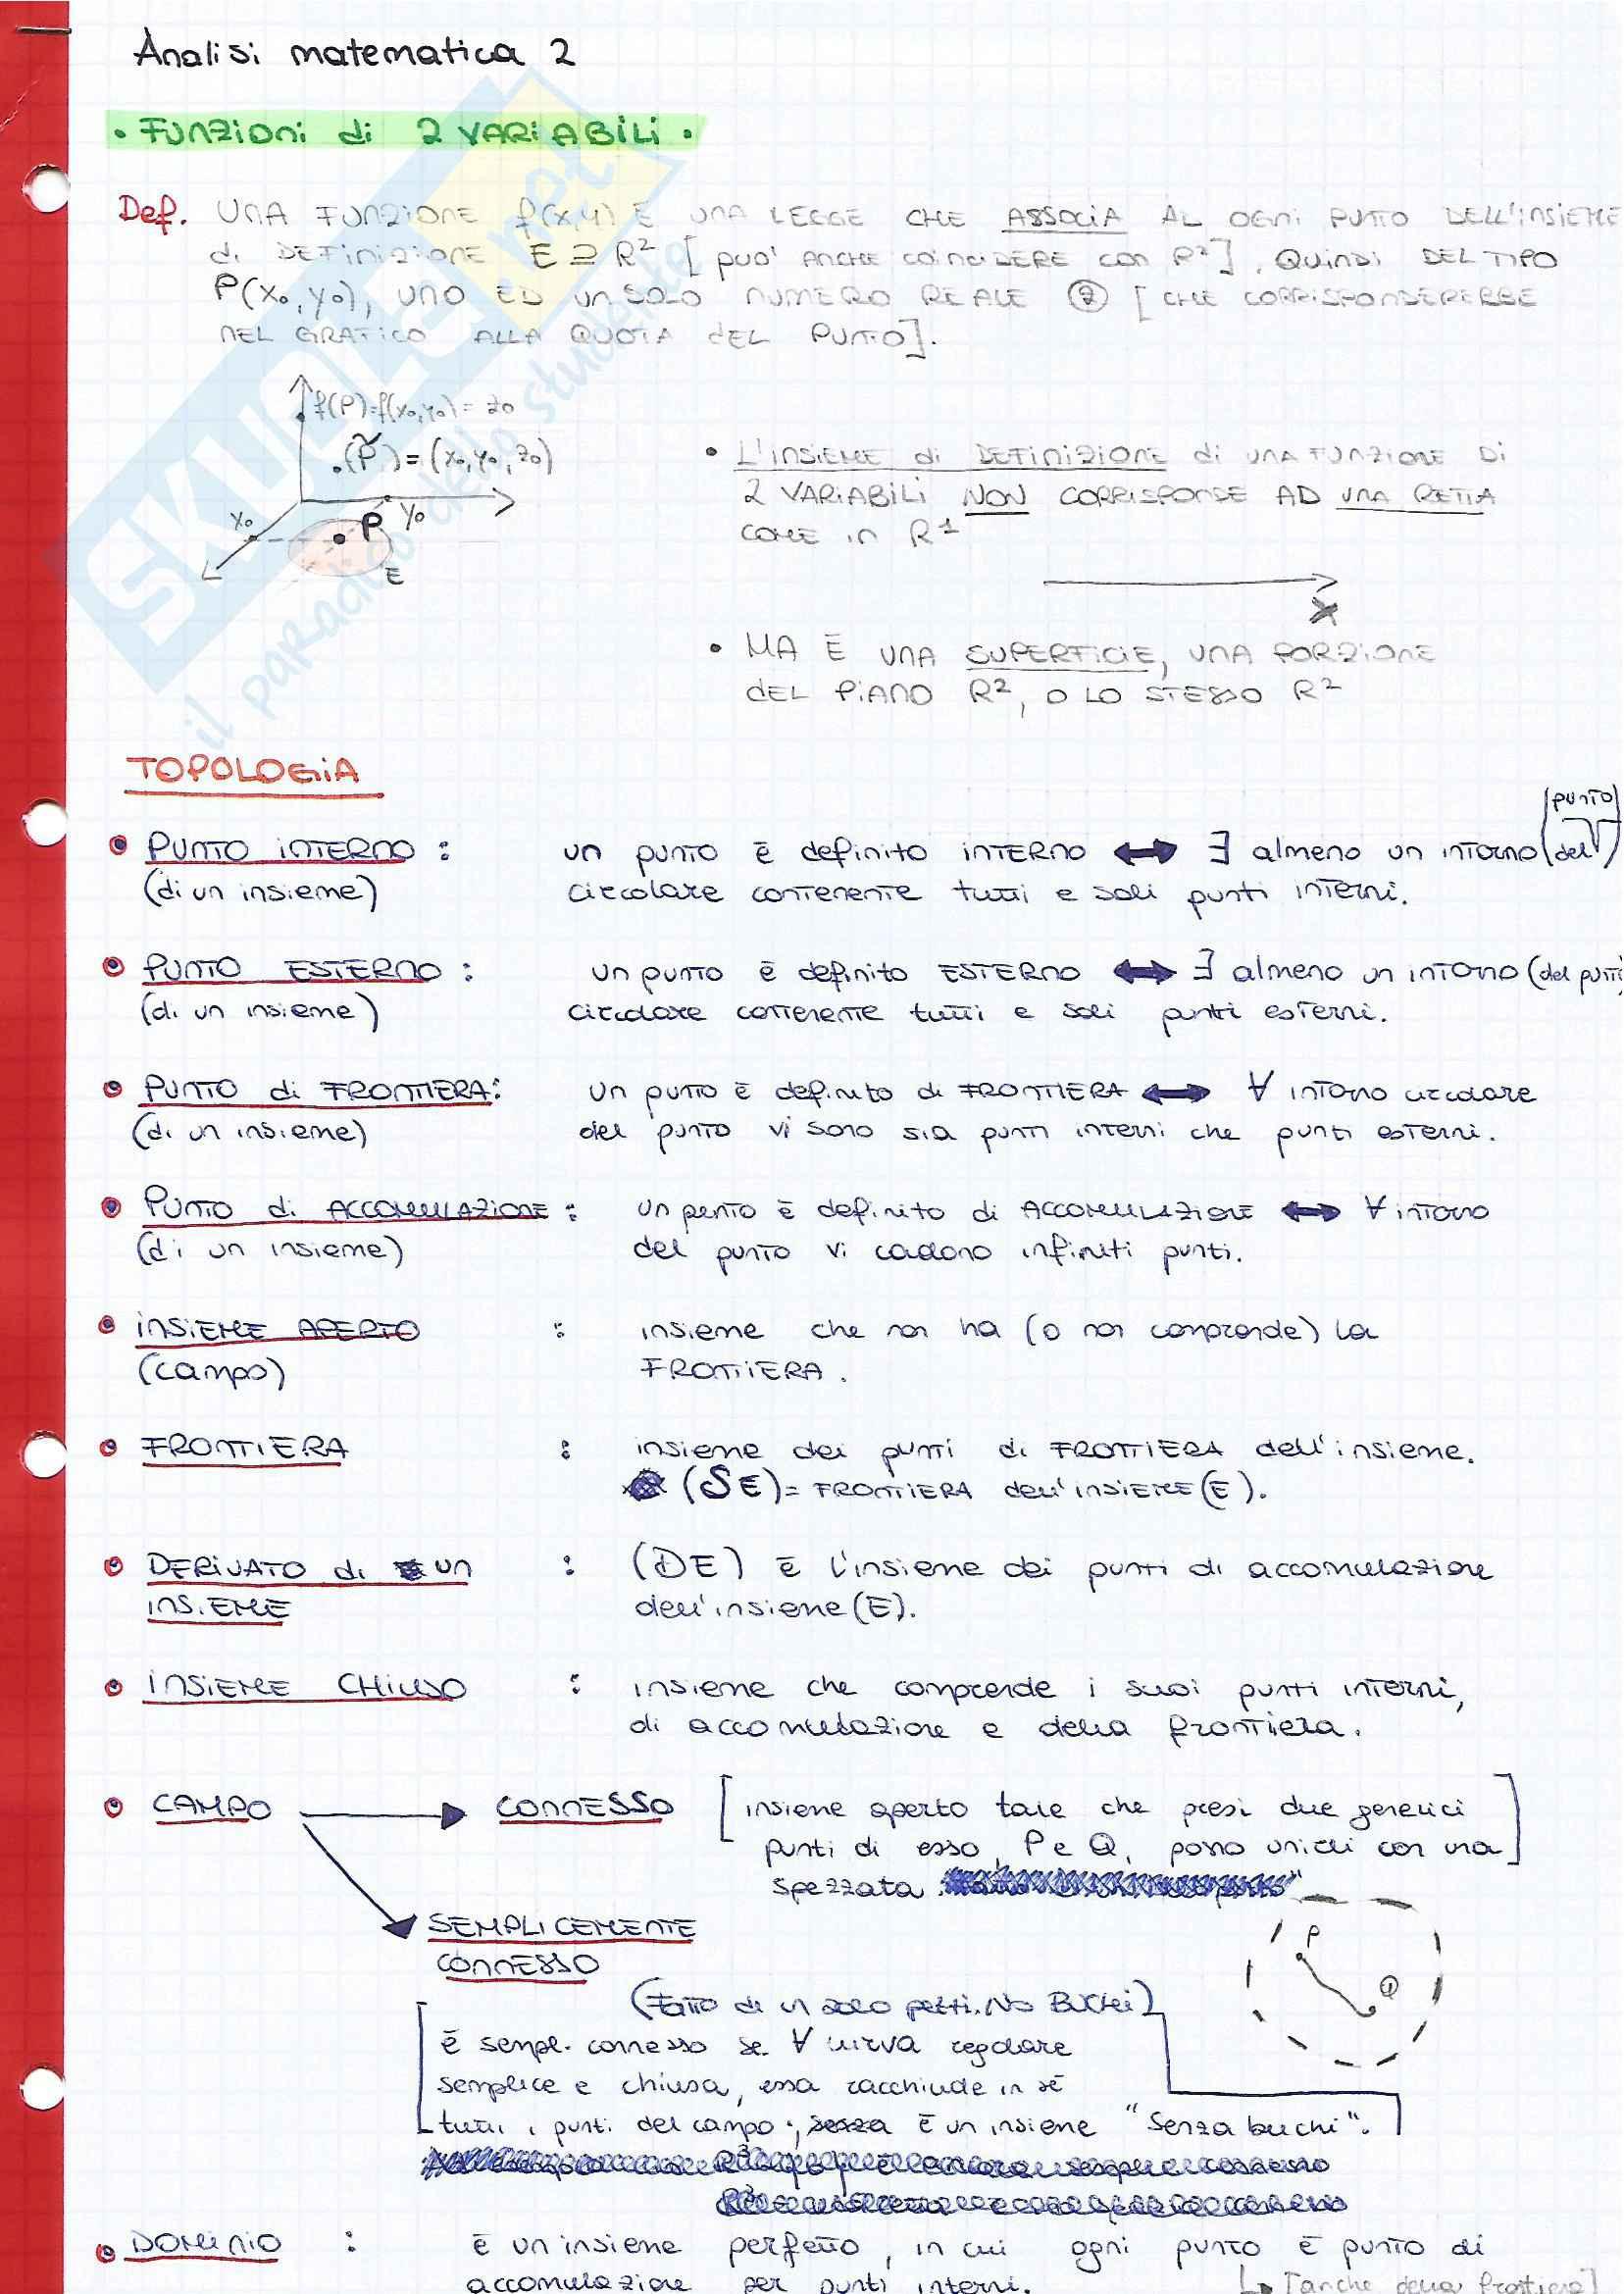 appunto B. Germano Analisi matematica II